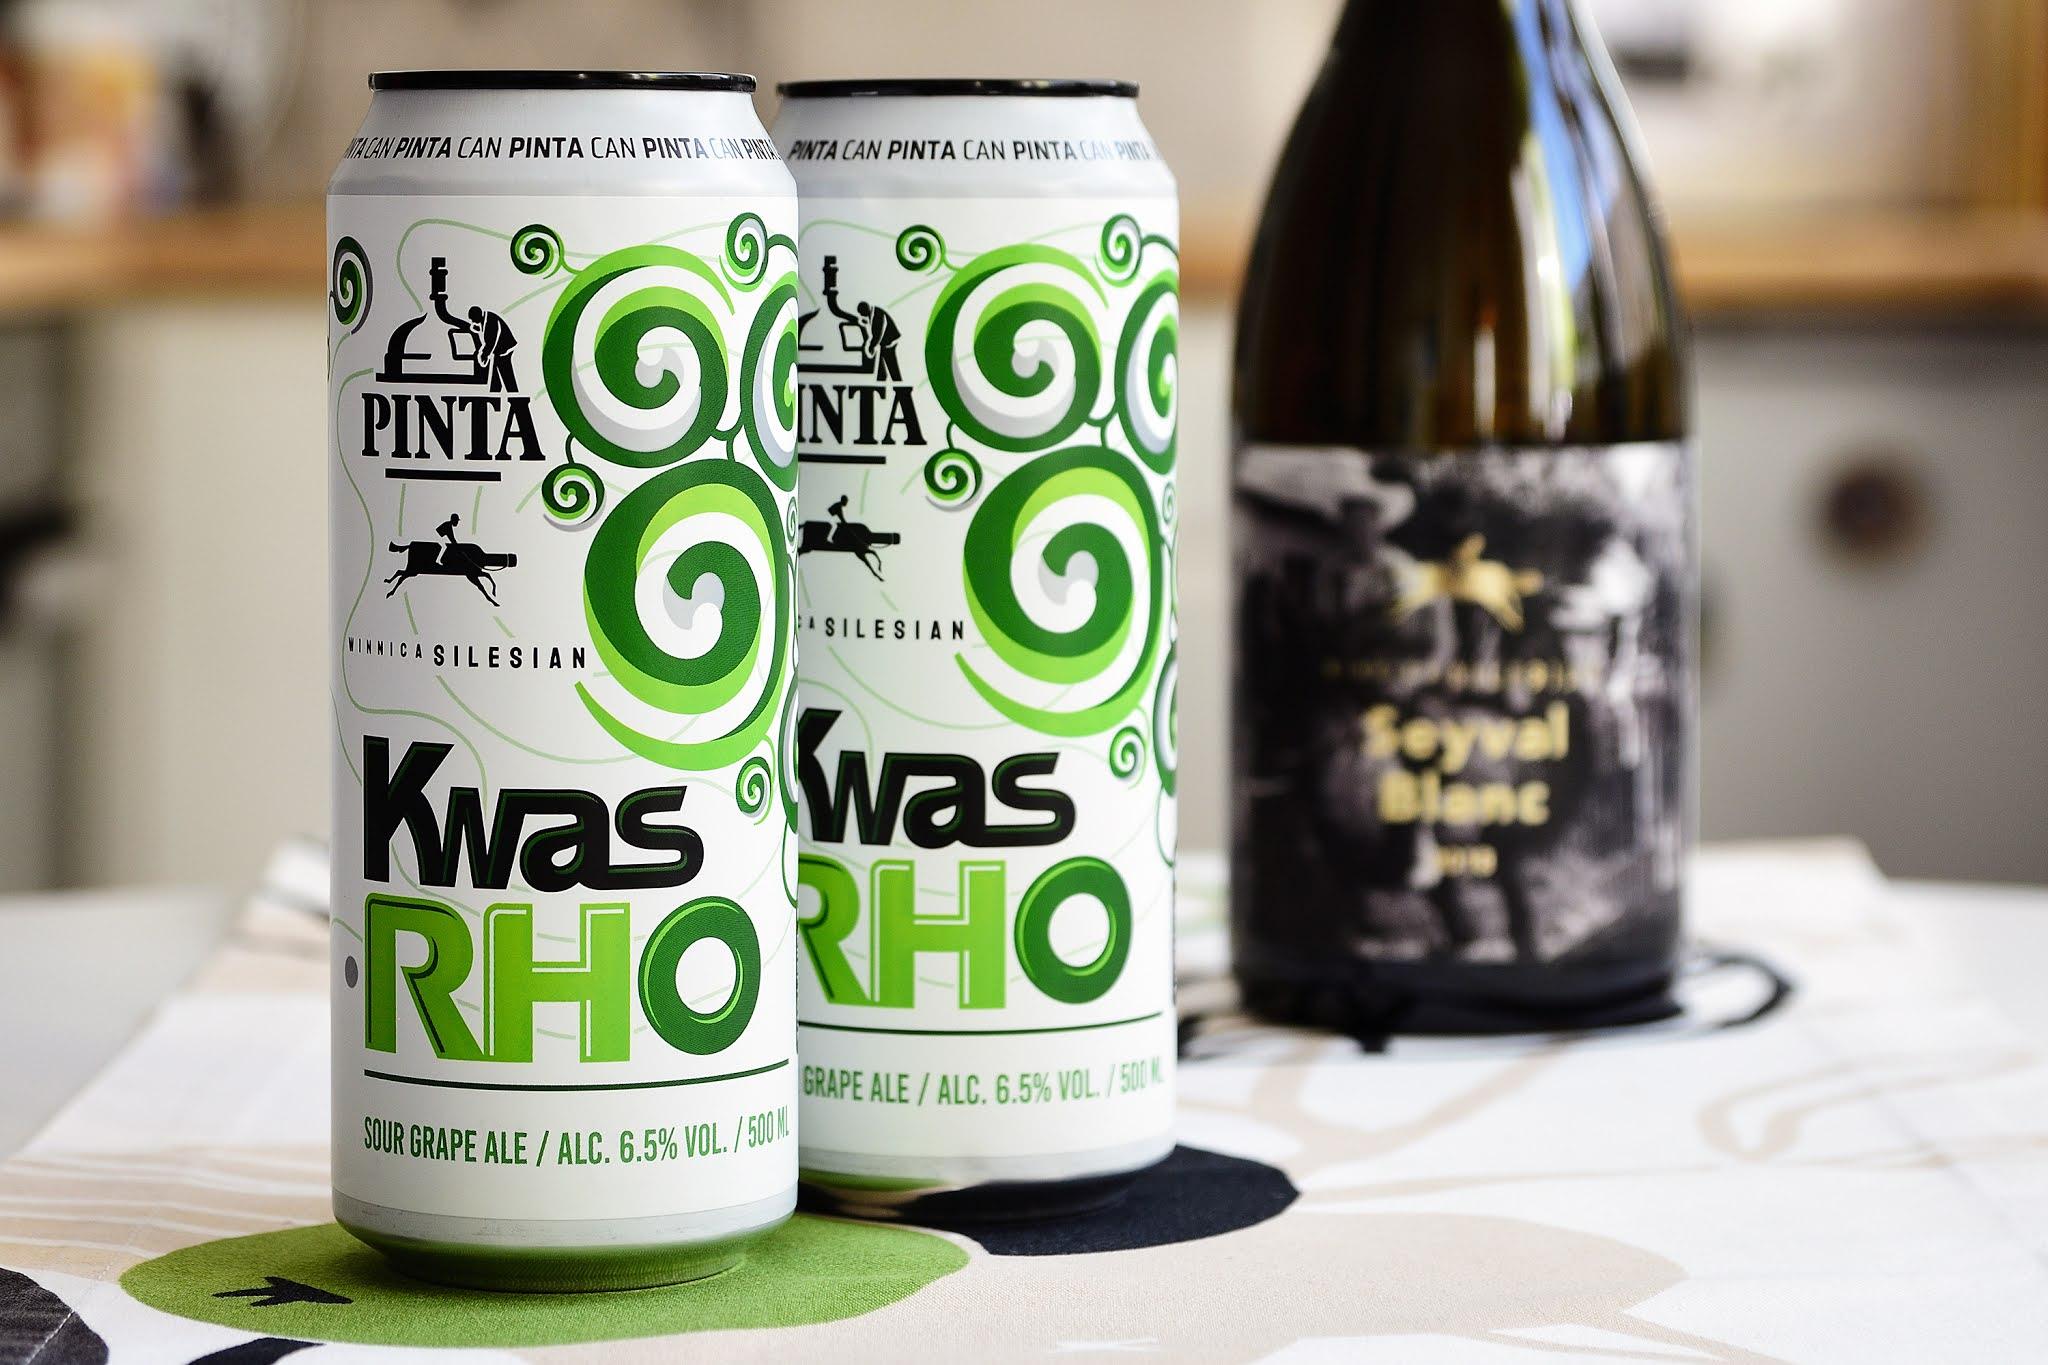 Pinta & Winnica Silesian - Kwas Rho